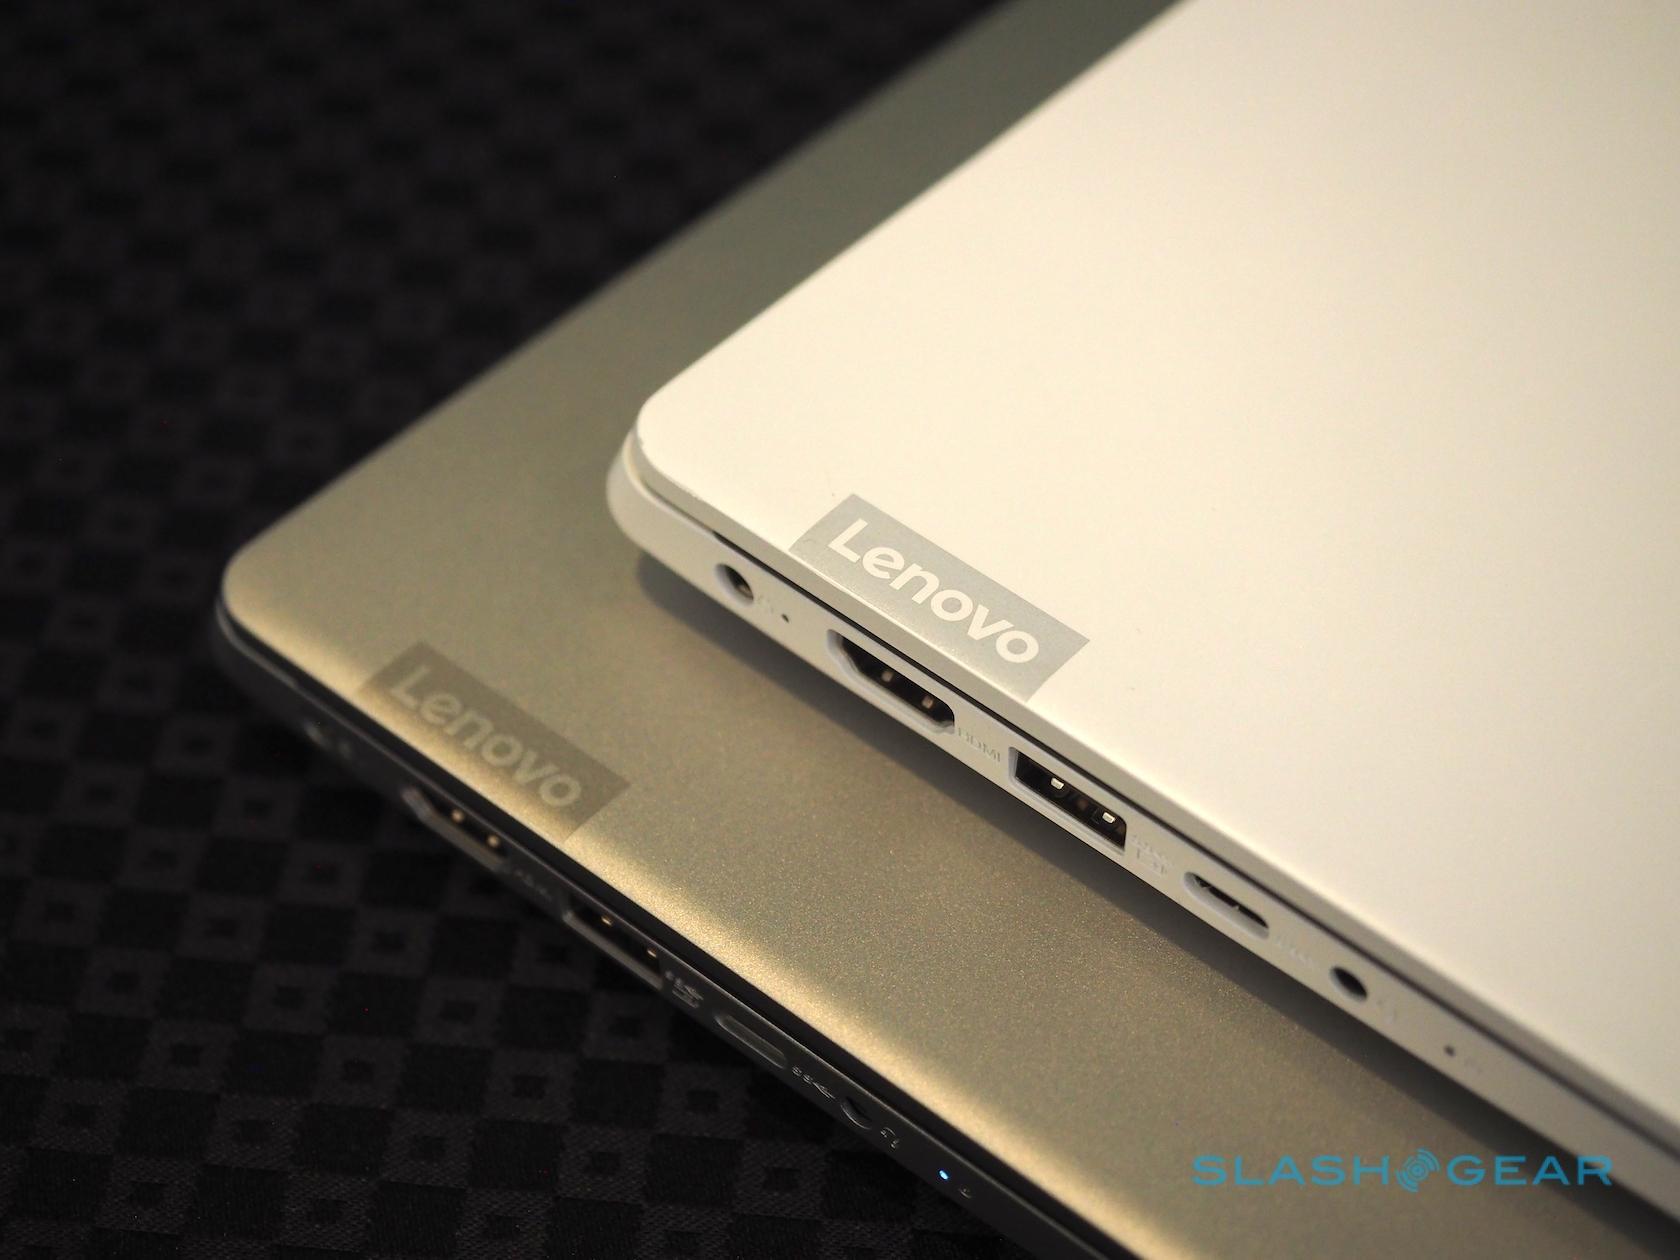 Lenovo IdeaPad 330, 330S, and 530S laptops start at $250